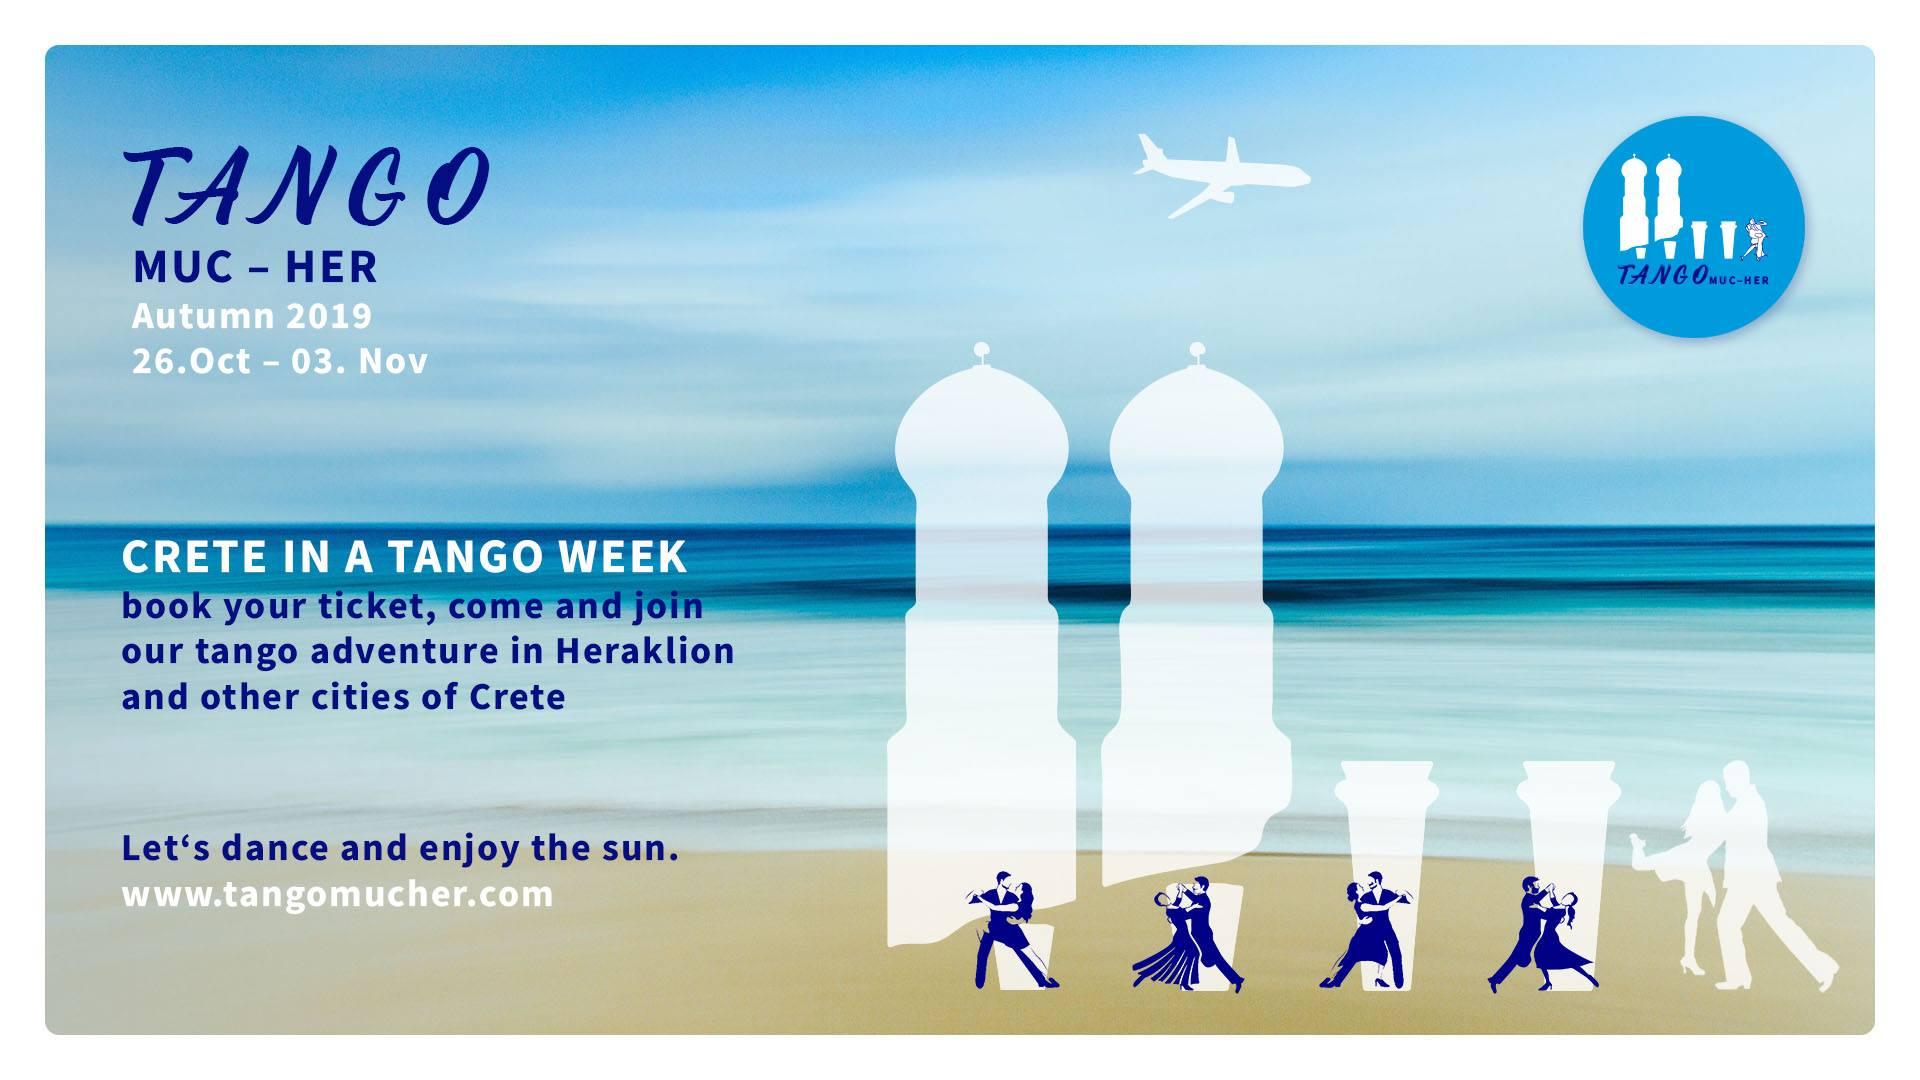 Tango MUC HER Crete in a Tango Week - [TMD] Tango Marathon